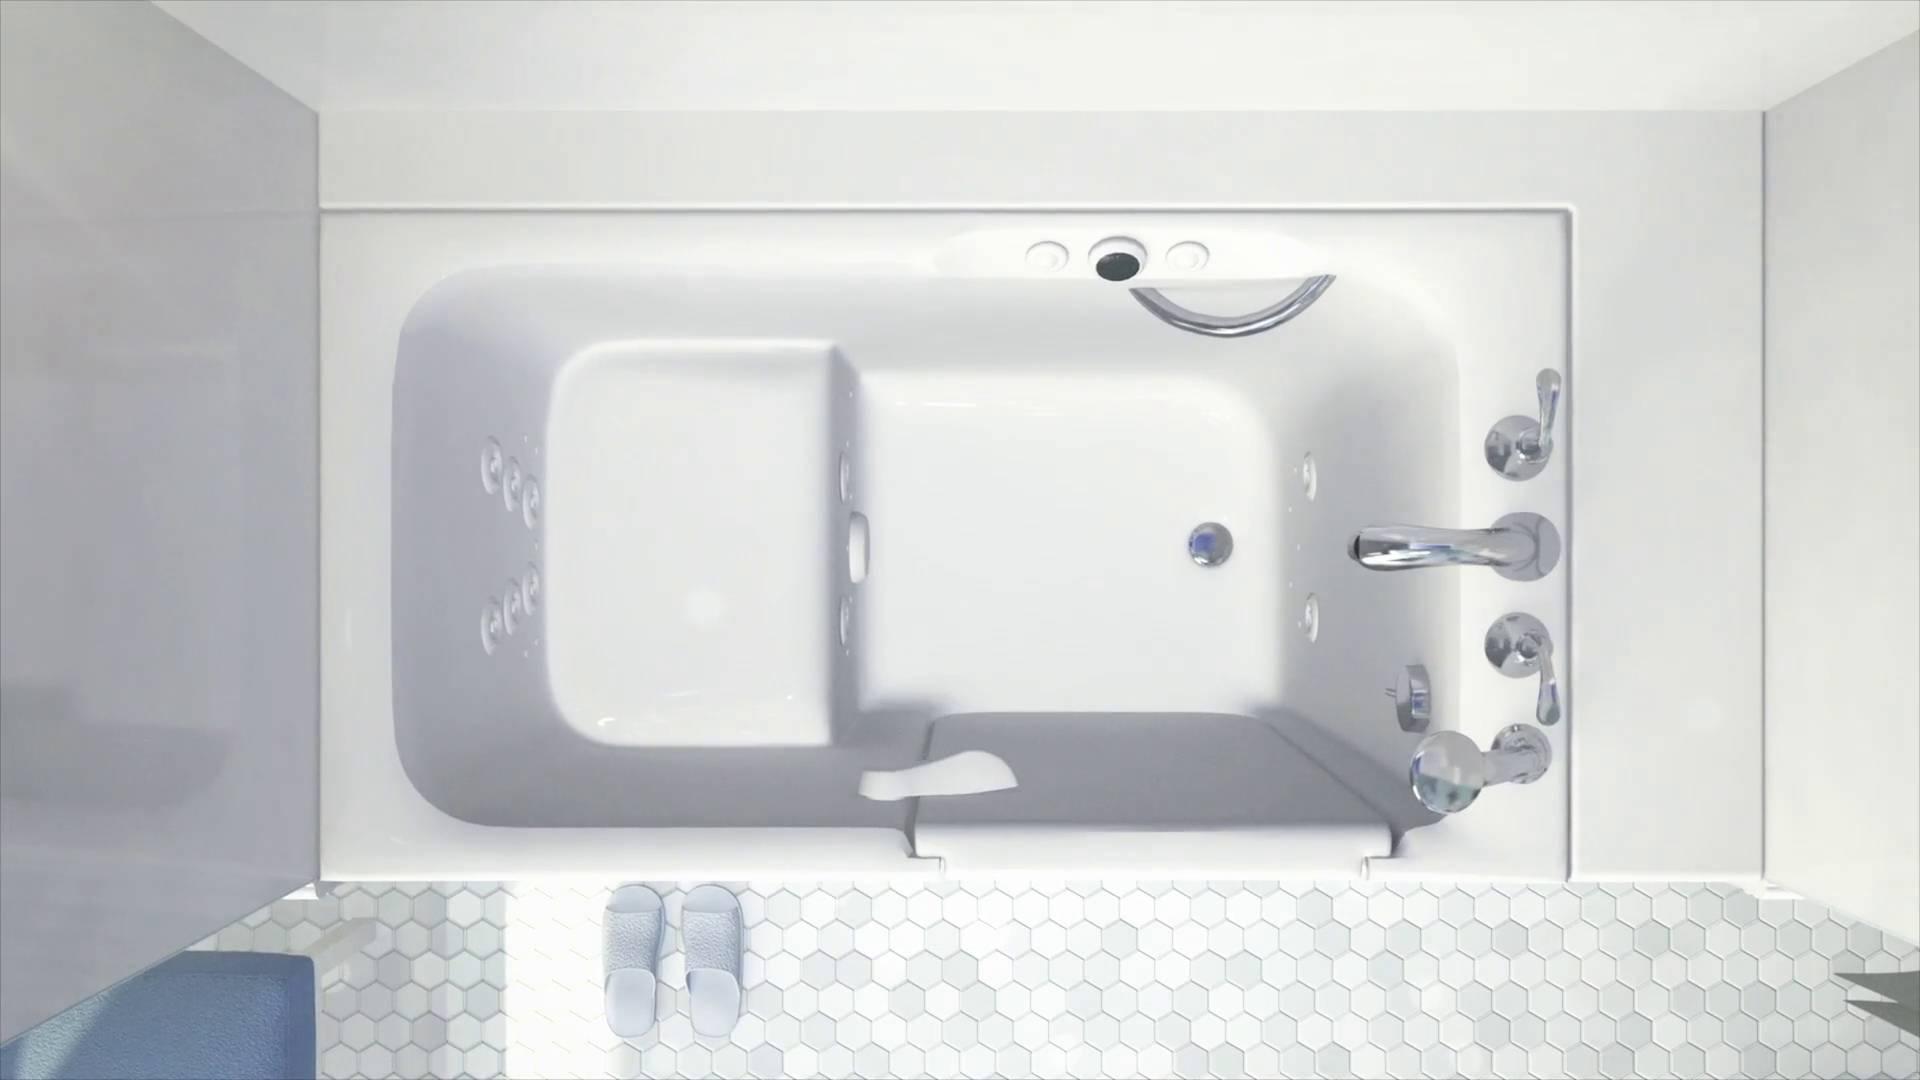 jacuzzi walk in tub showroom design inspiration furniture design rh pupiloflove com